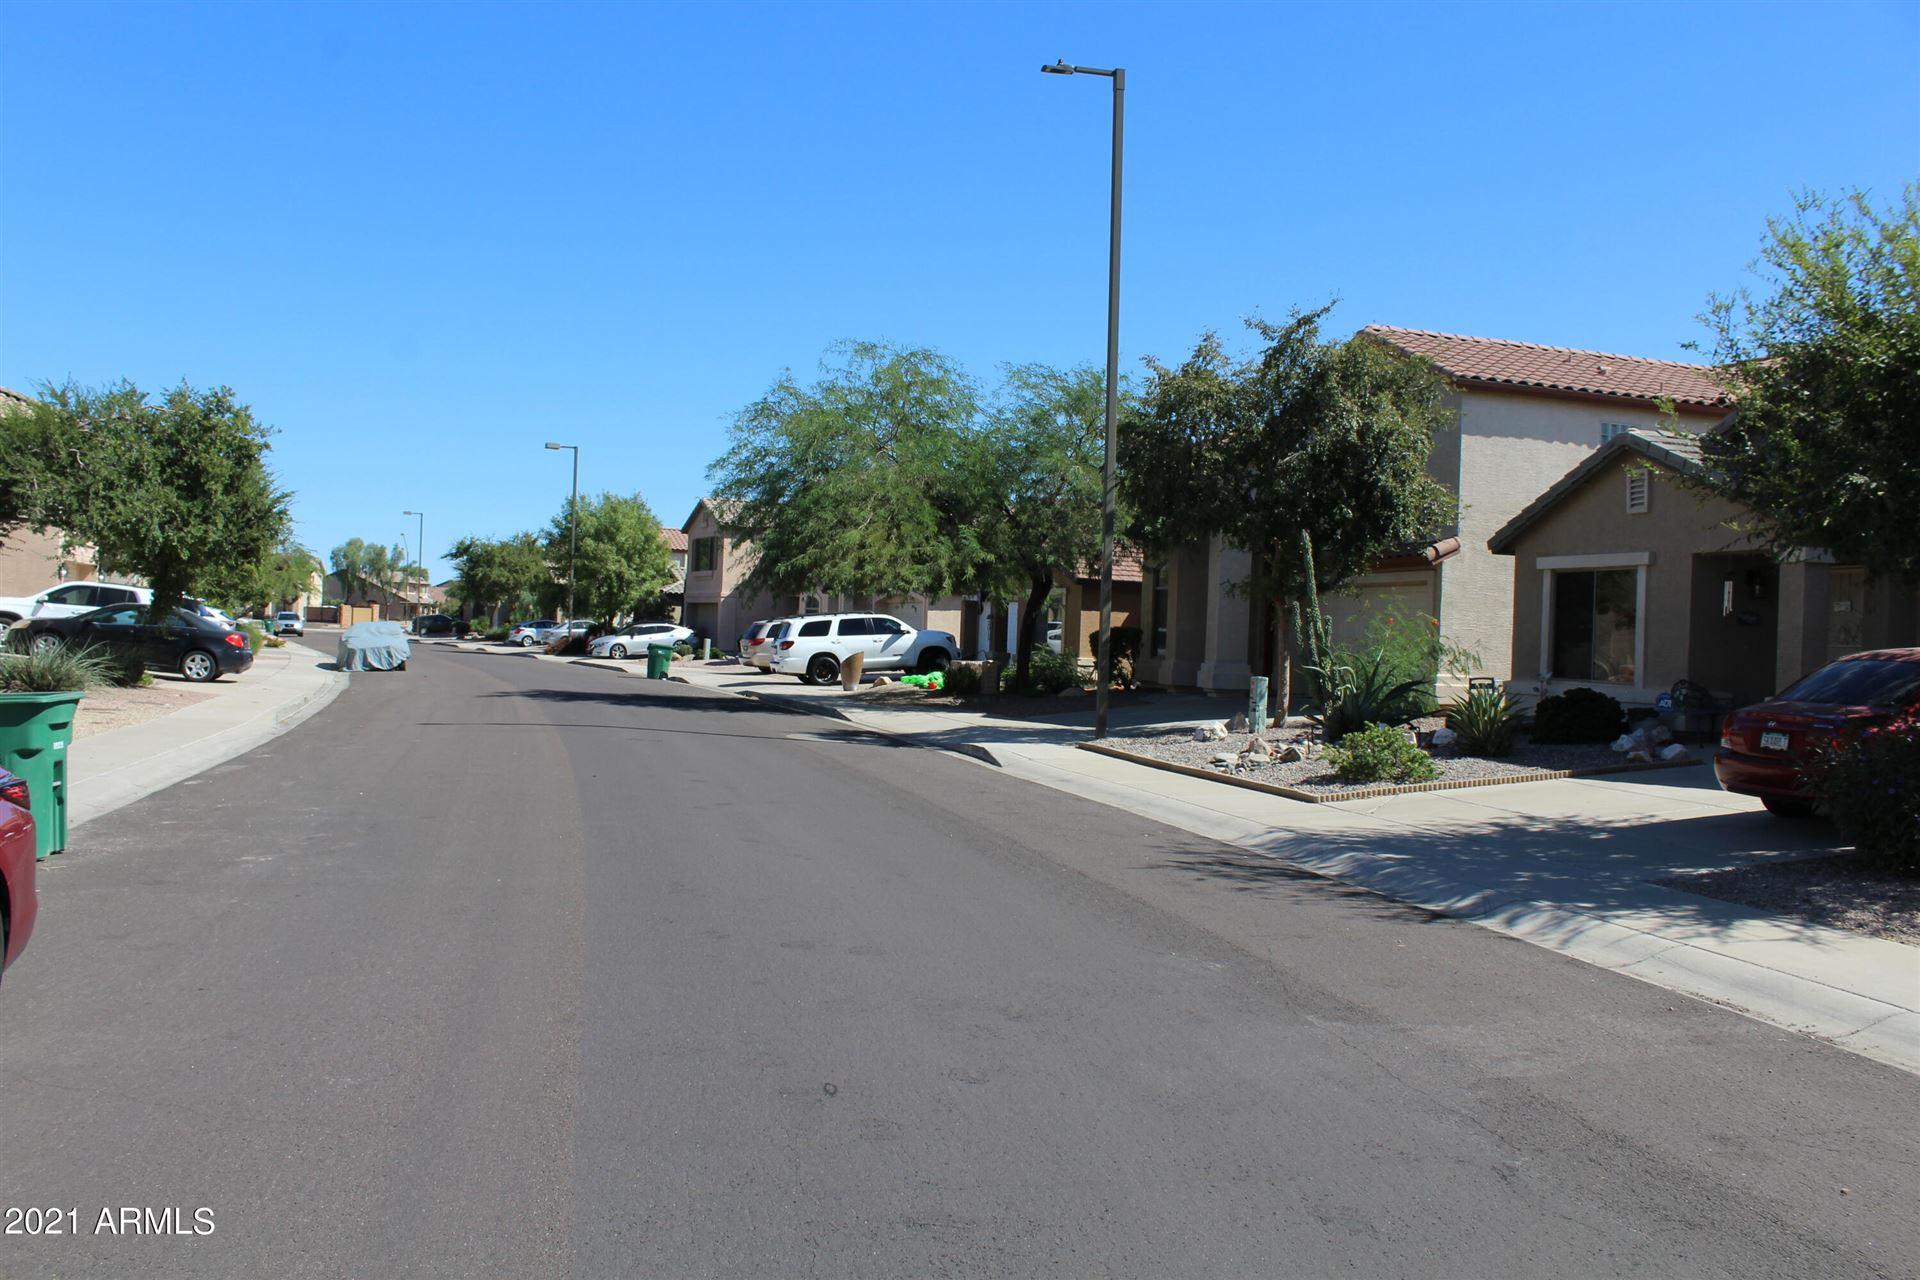 Photo of 12551 W WINDSOR Boulevard, Litchfield Park, AZ 85340 (MLS # 6308087)